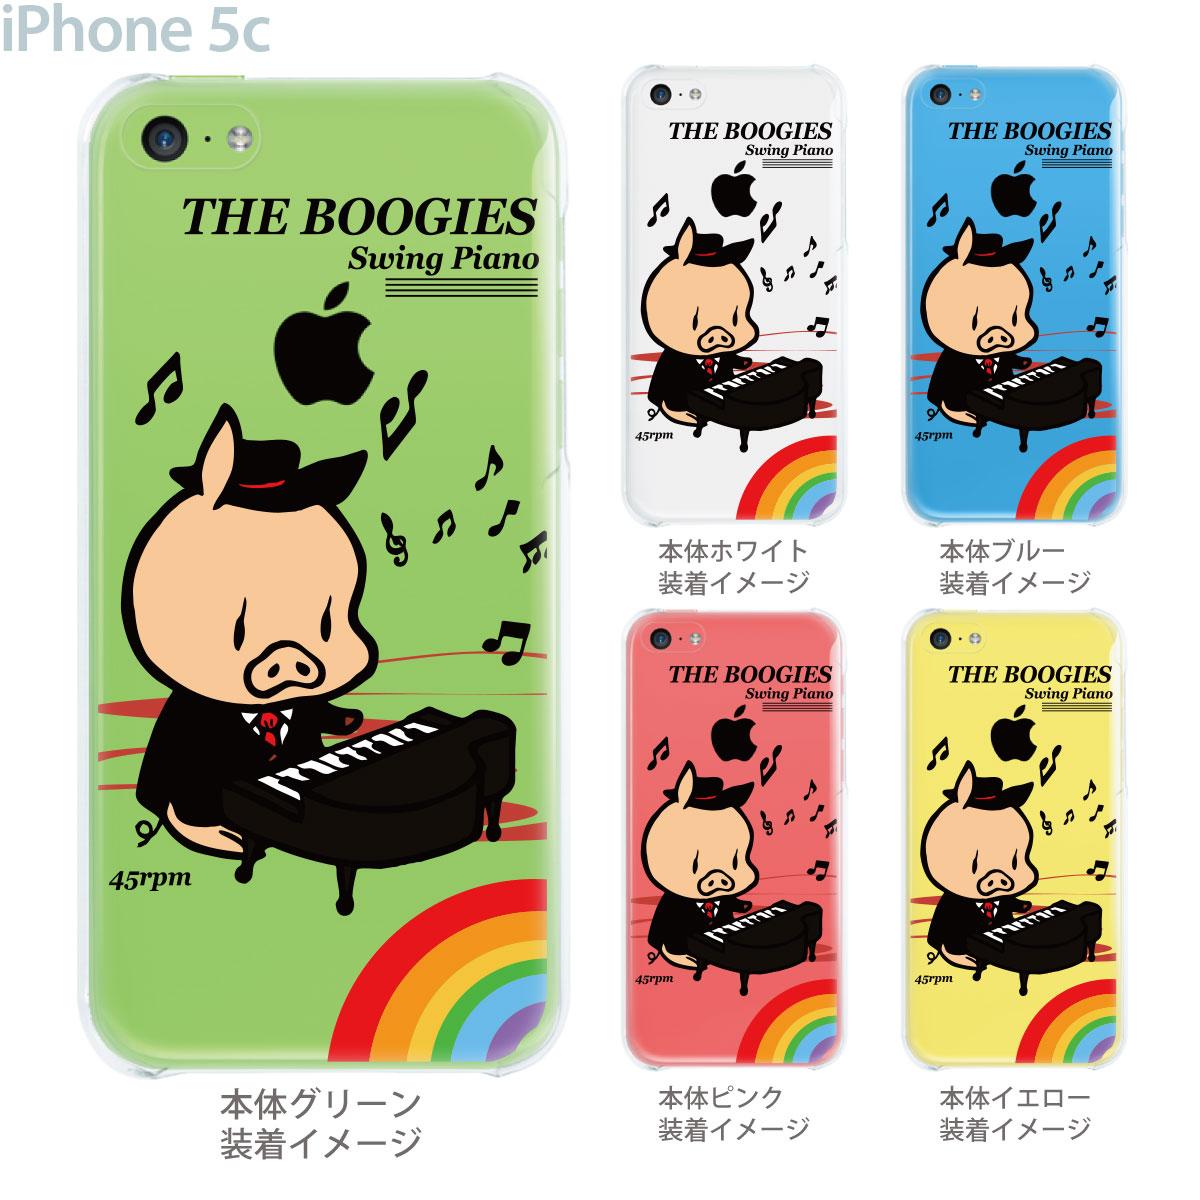 【SWEET ROCK TOWN】【iPhone5c】【iPhone5cケース】【ケース】【カバー】【スマホケース】【クリア】【クリアケース】【Clear Arts】【アート】【イラスト】 46-ip5c-sh2012